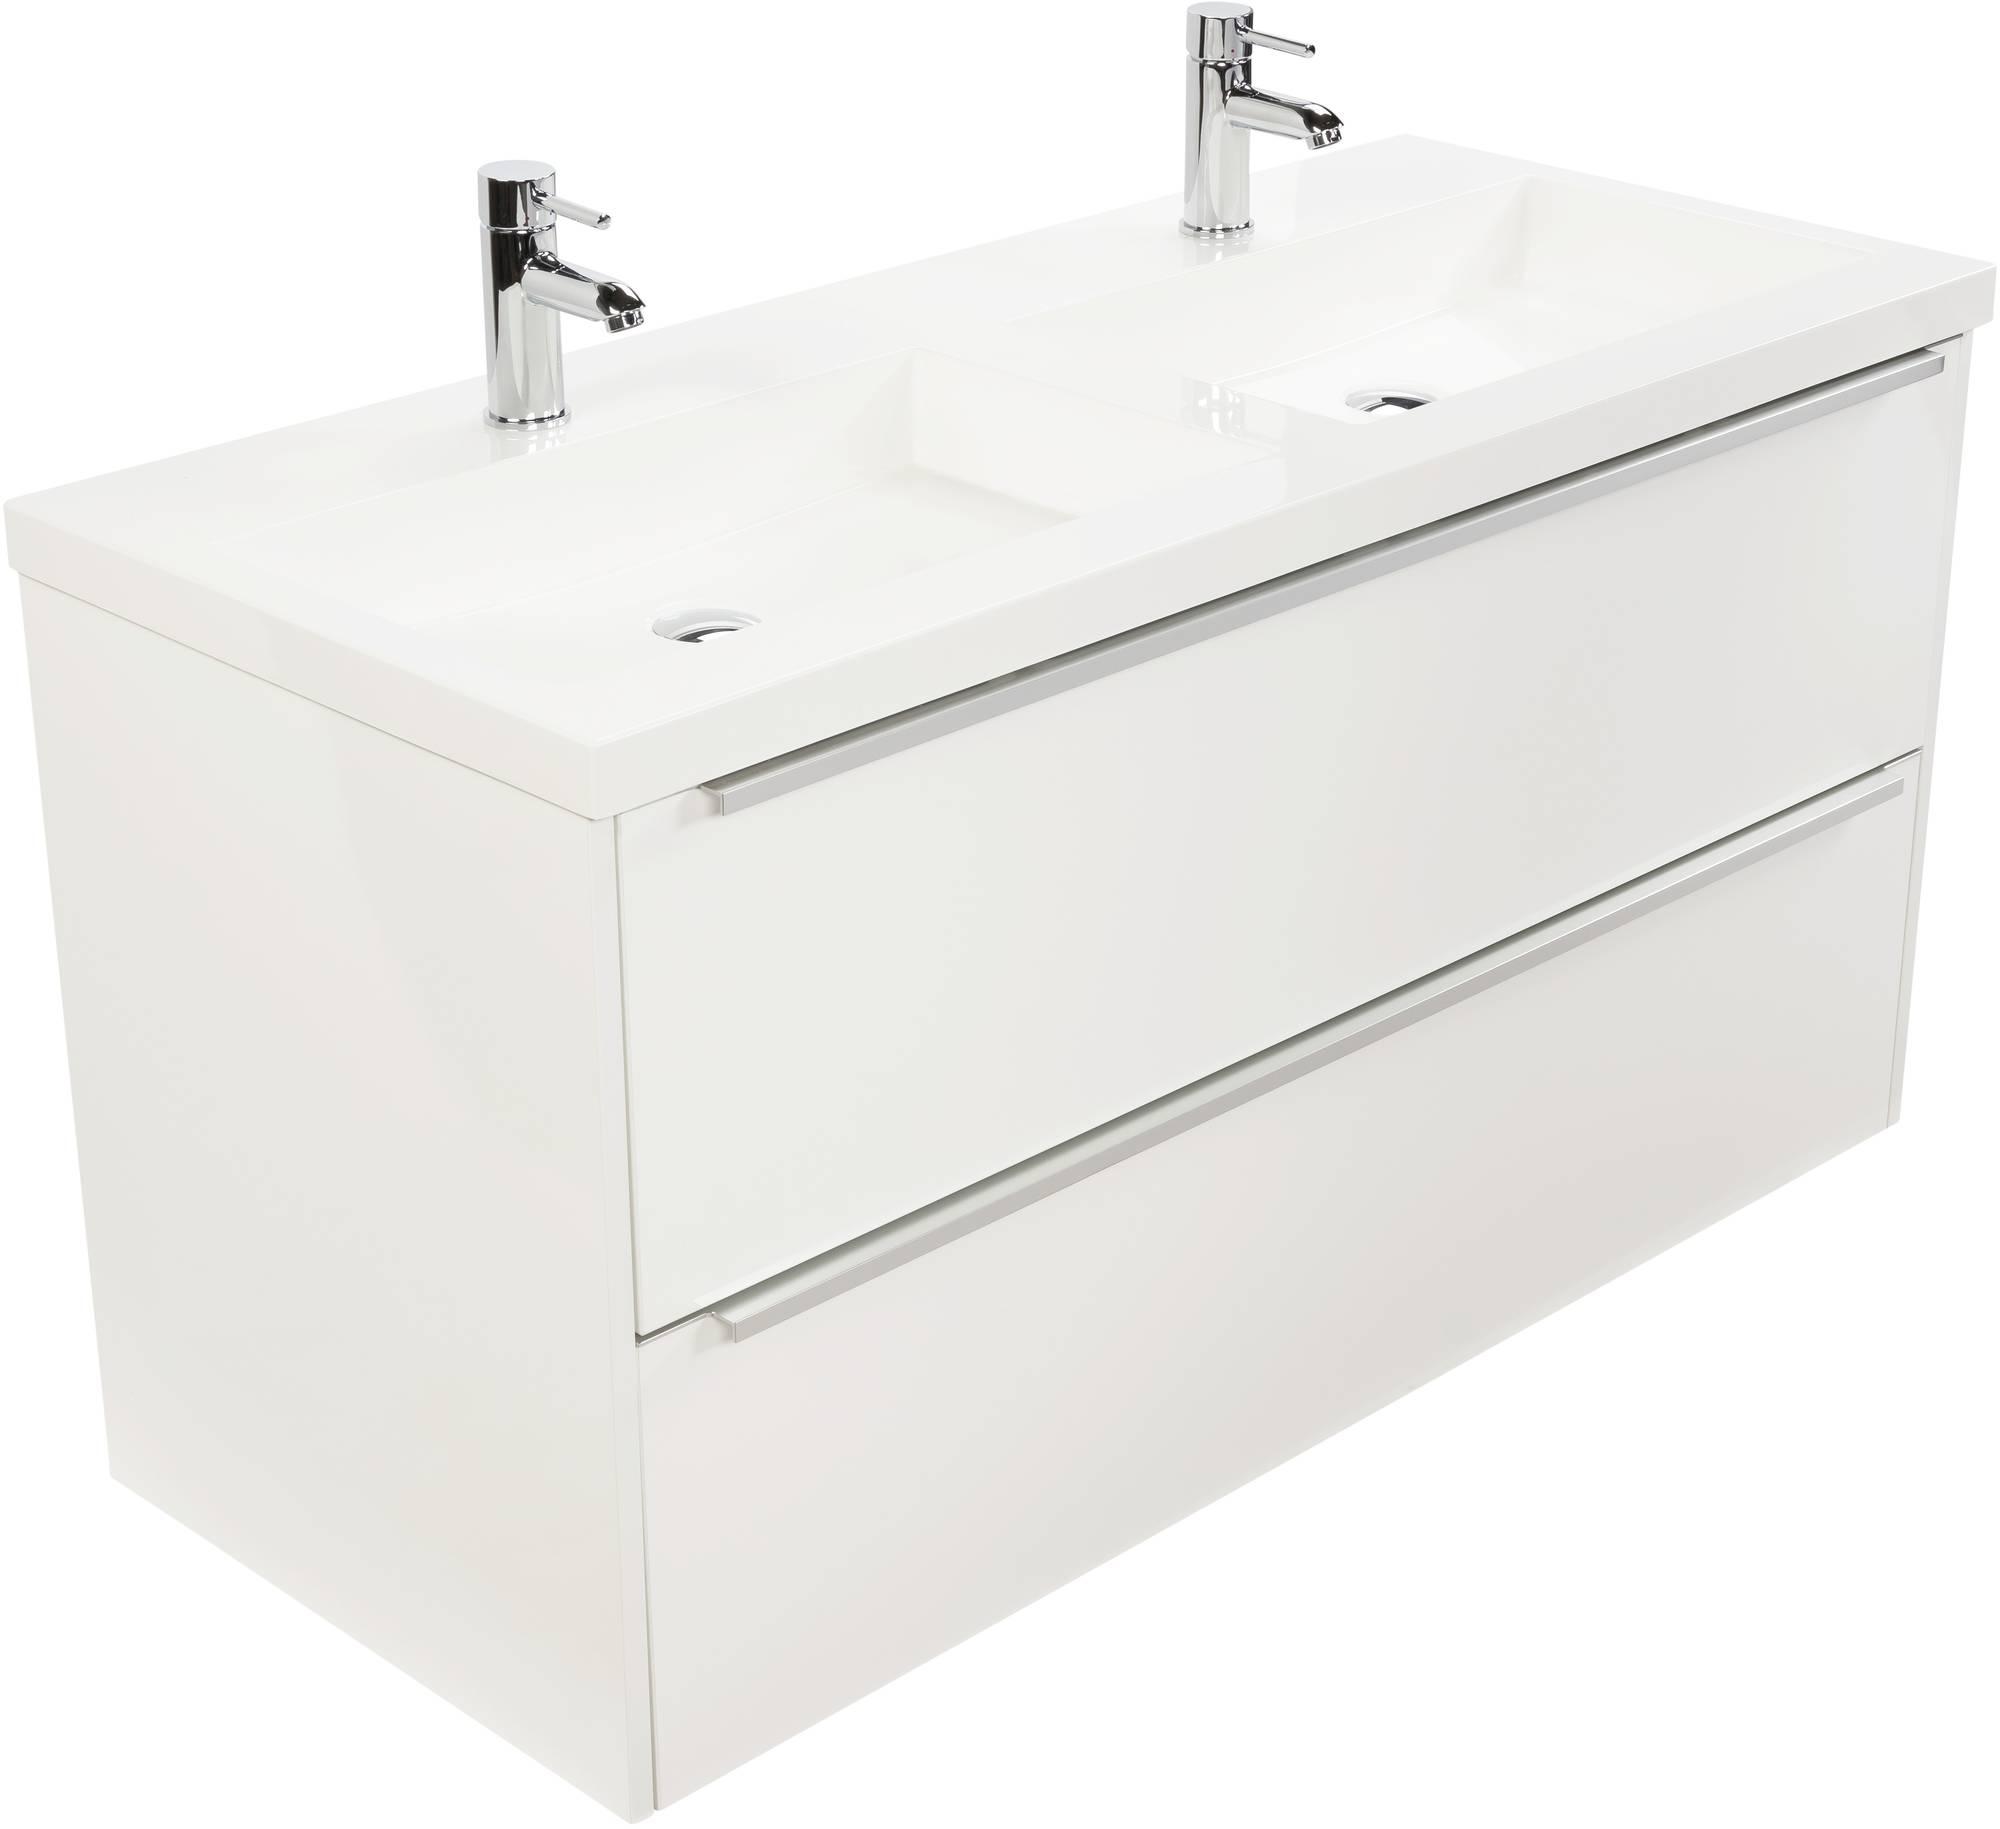 Saniselect Socan meubelset 2 lades met dubbele mineraalmarmere wastafel 120cm Mat Wit